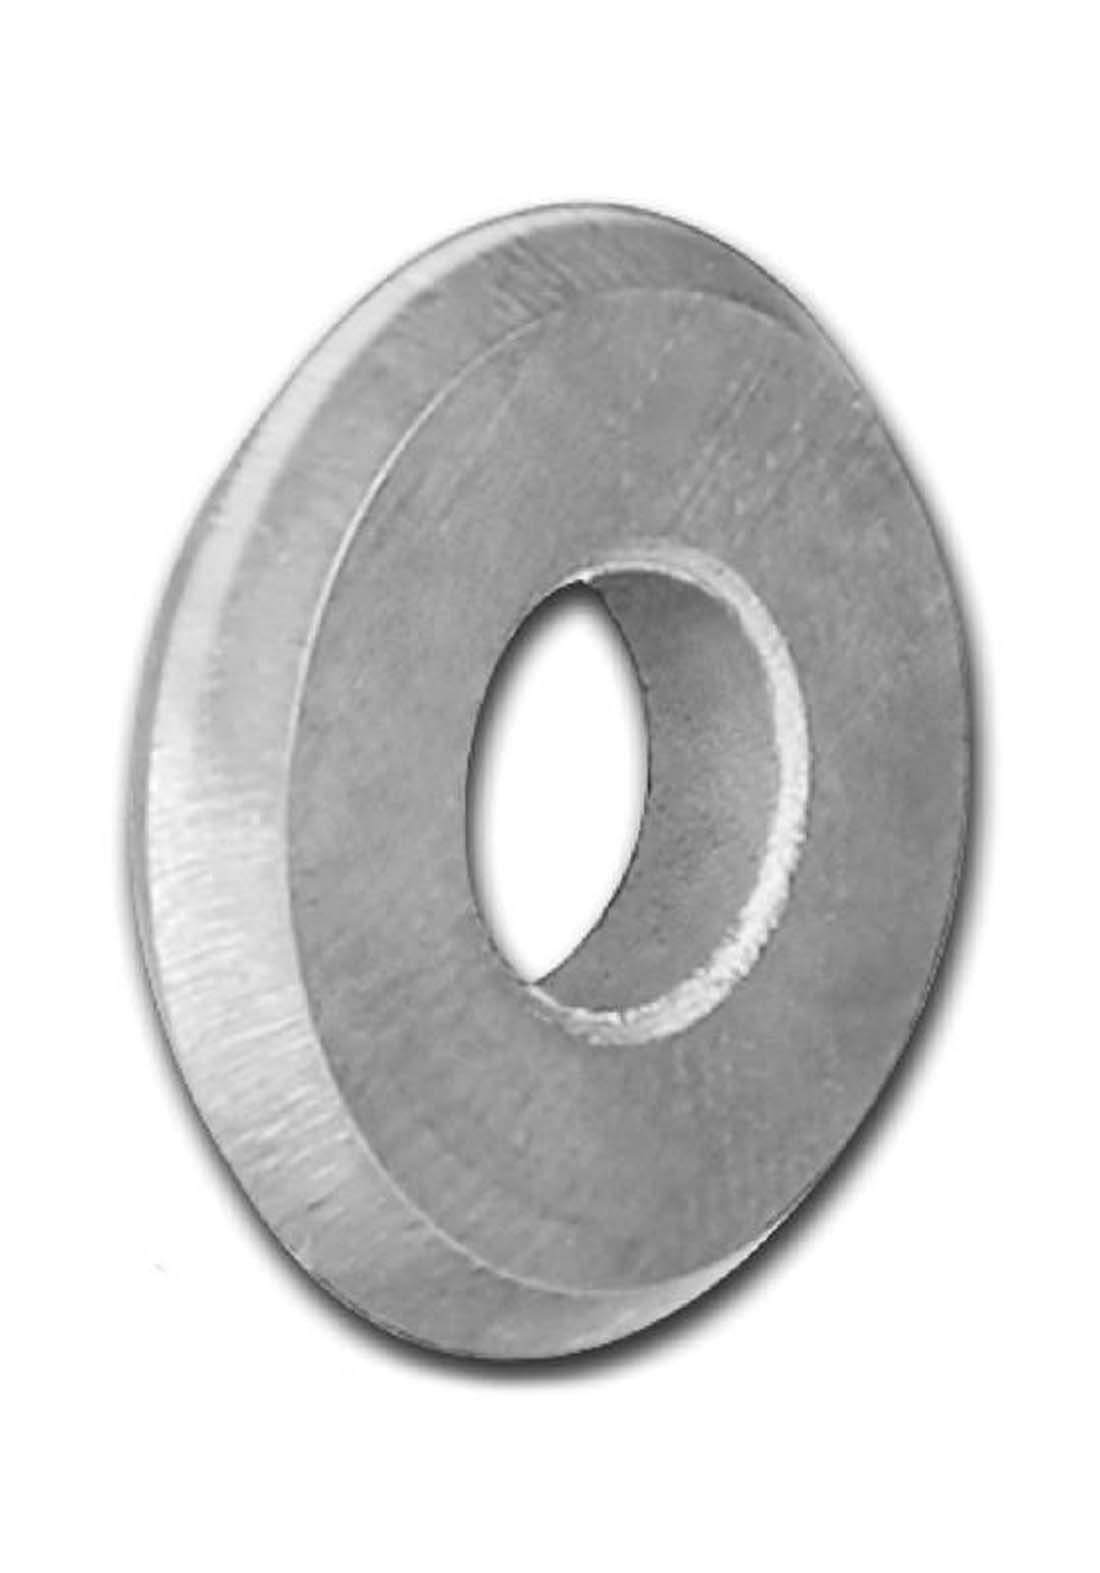 Ingco HTC04600B Tile Cutter Blade 600 mm المازة قاطعة السيراميك